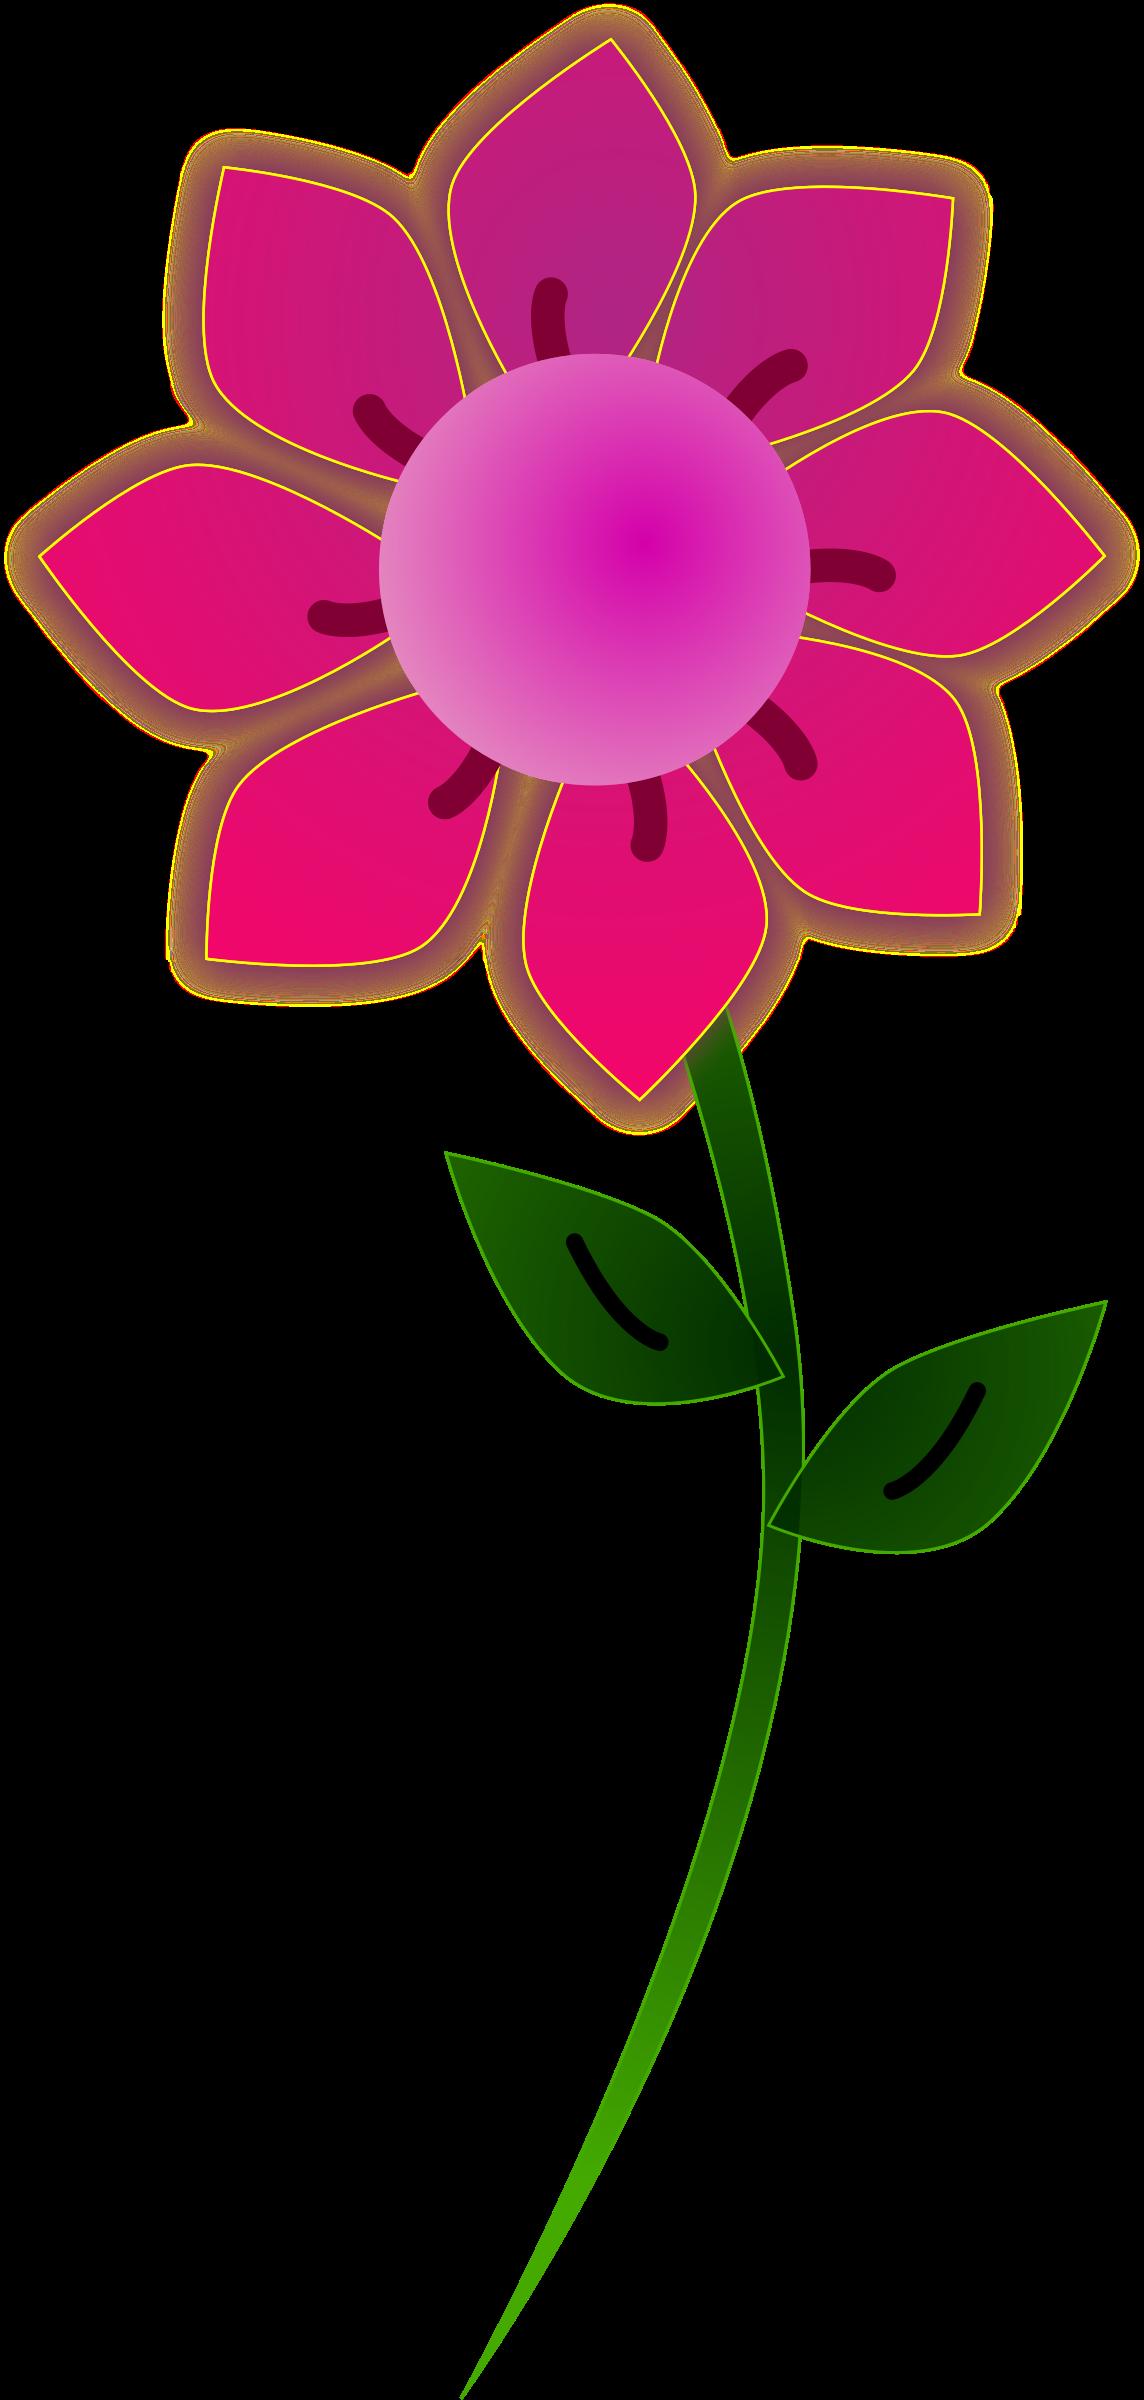 Pink clipart sunflower. Sun flower big image